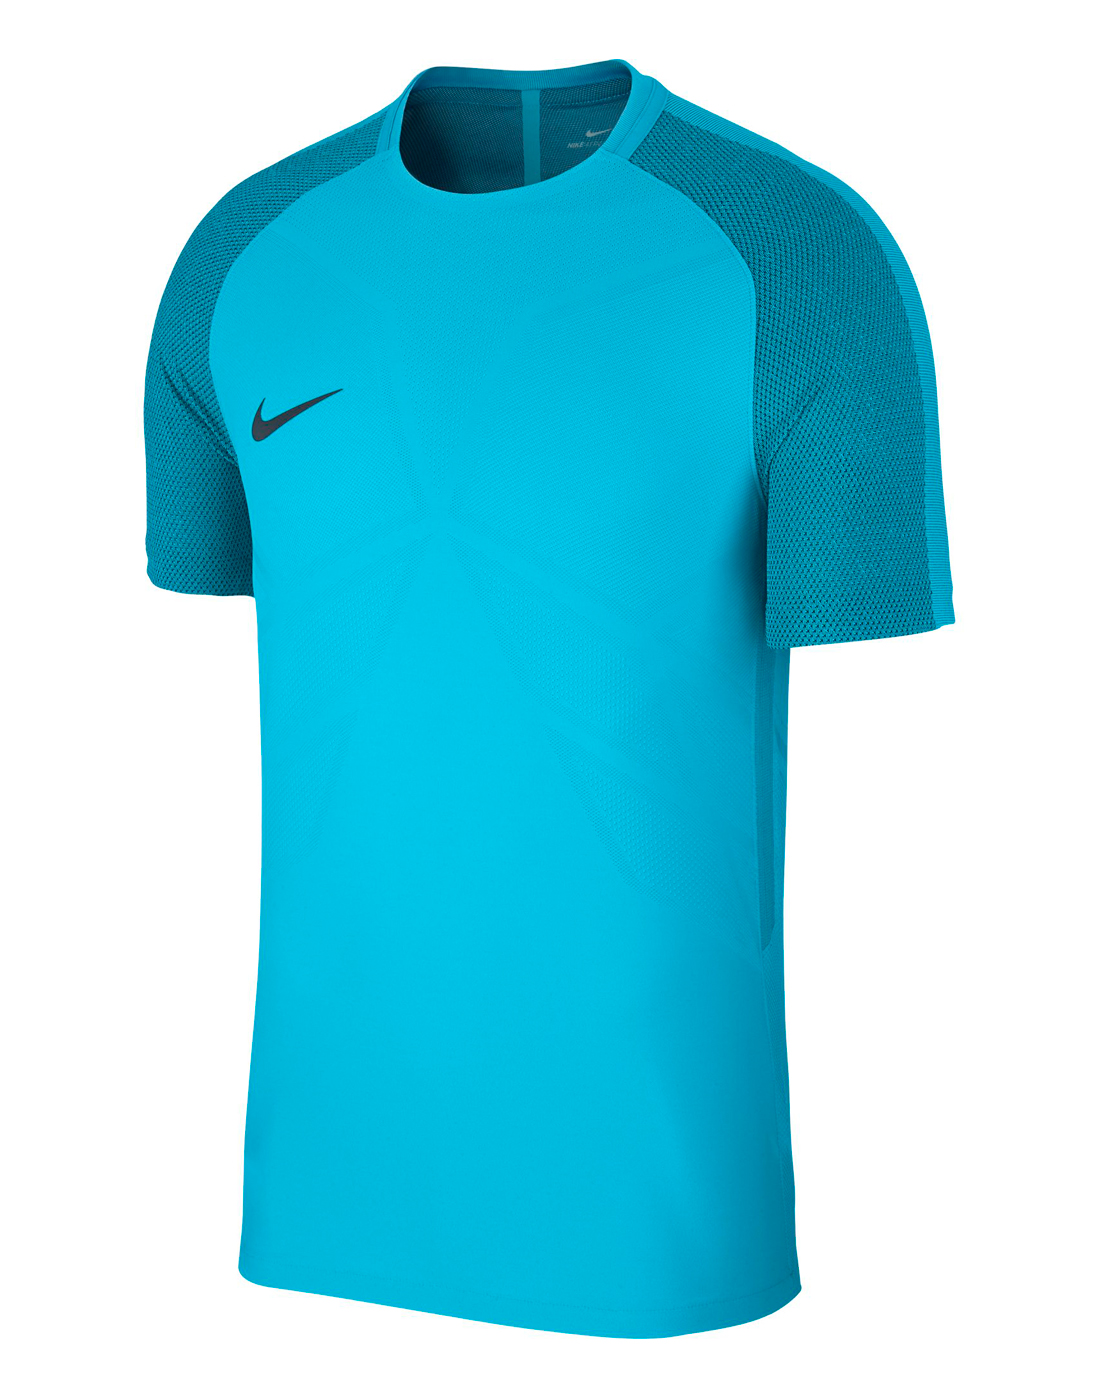 52361773 Men's Nike Aeroswift Stike Training Jersey | Blue | Life Style Sports